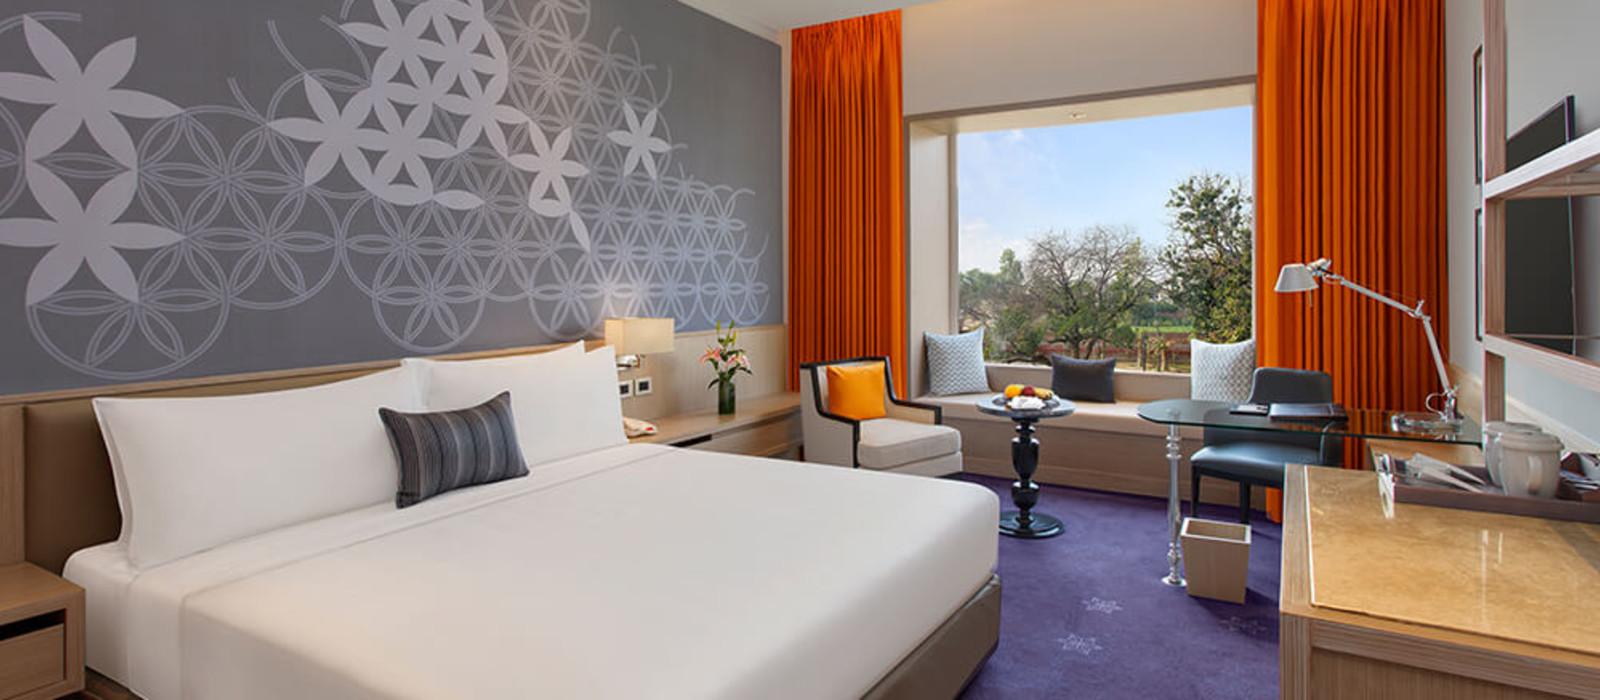 Hotel Welcom Amritsar Nordindien